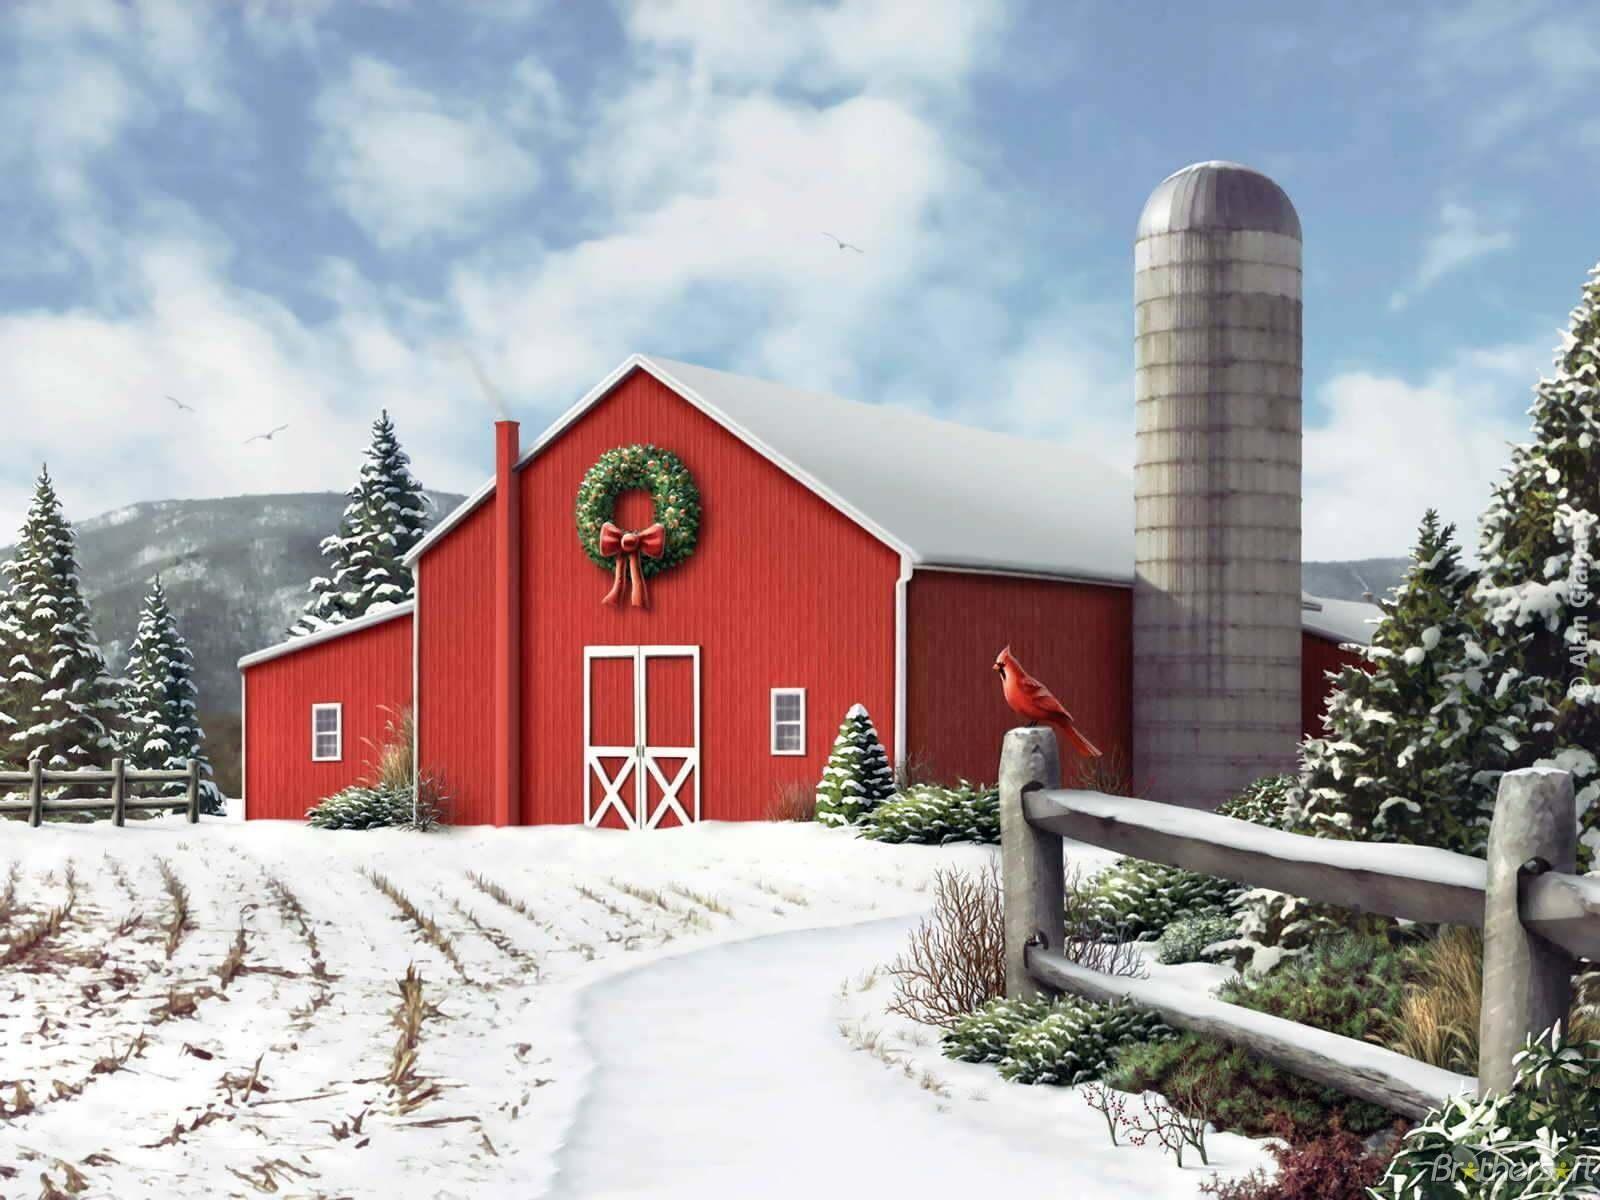 46 barn wallpaper screensavers on wallpapersafari - Winter farm scenes wallpaper ...